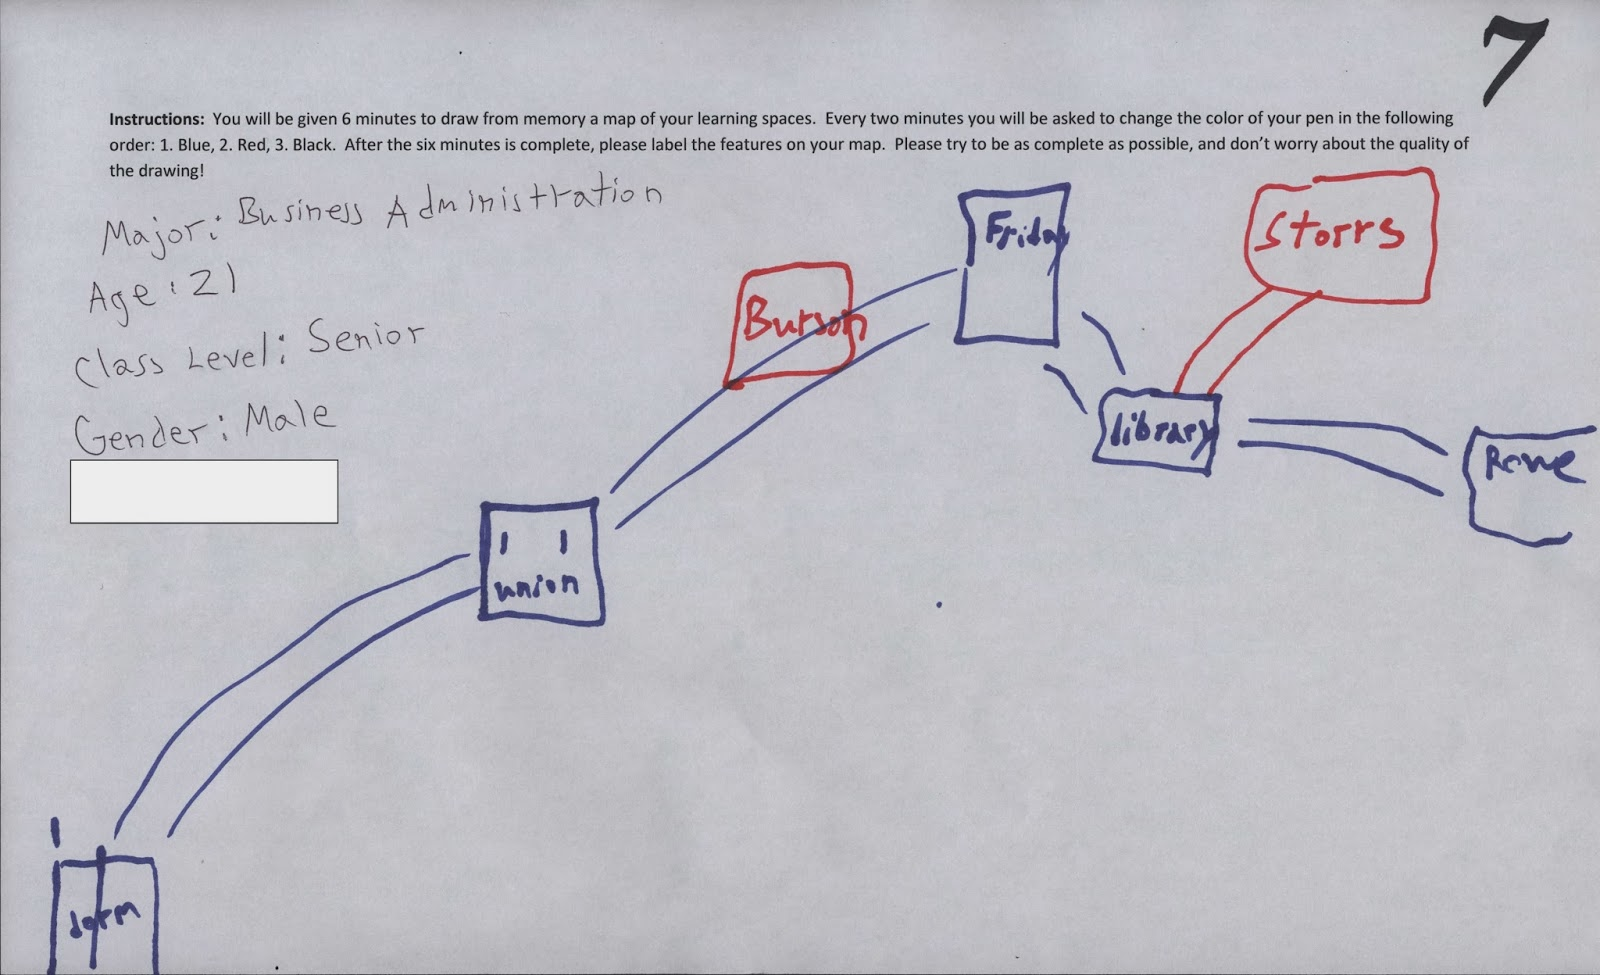 davidson college google maps essay project